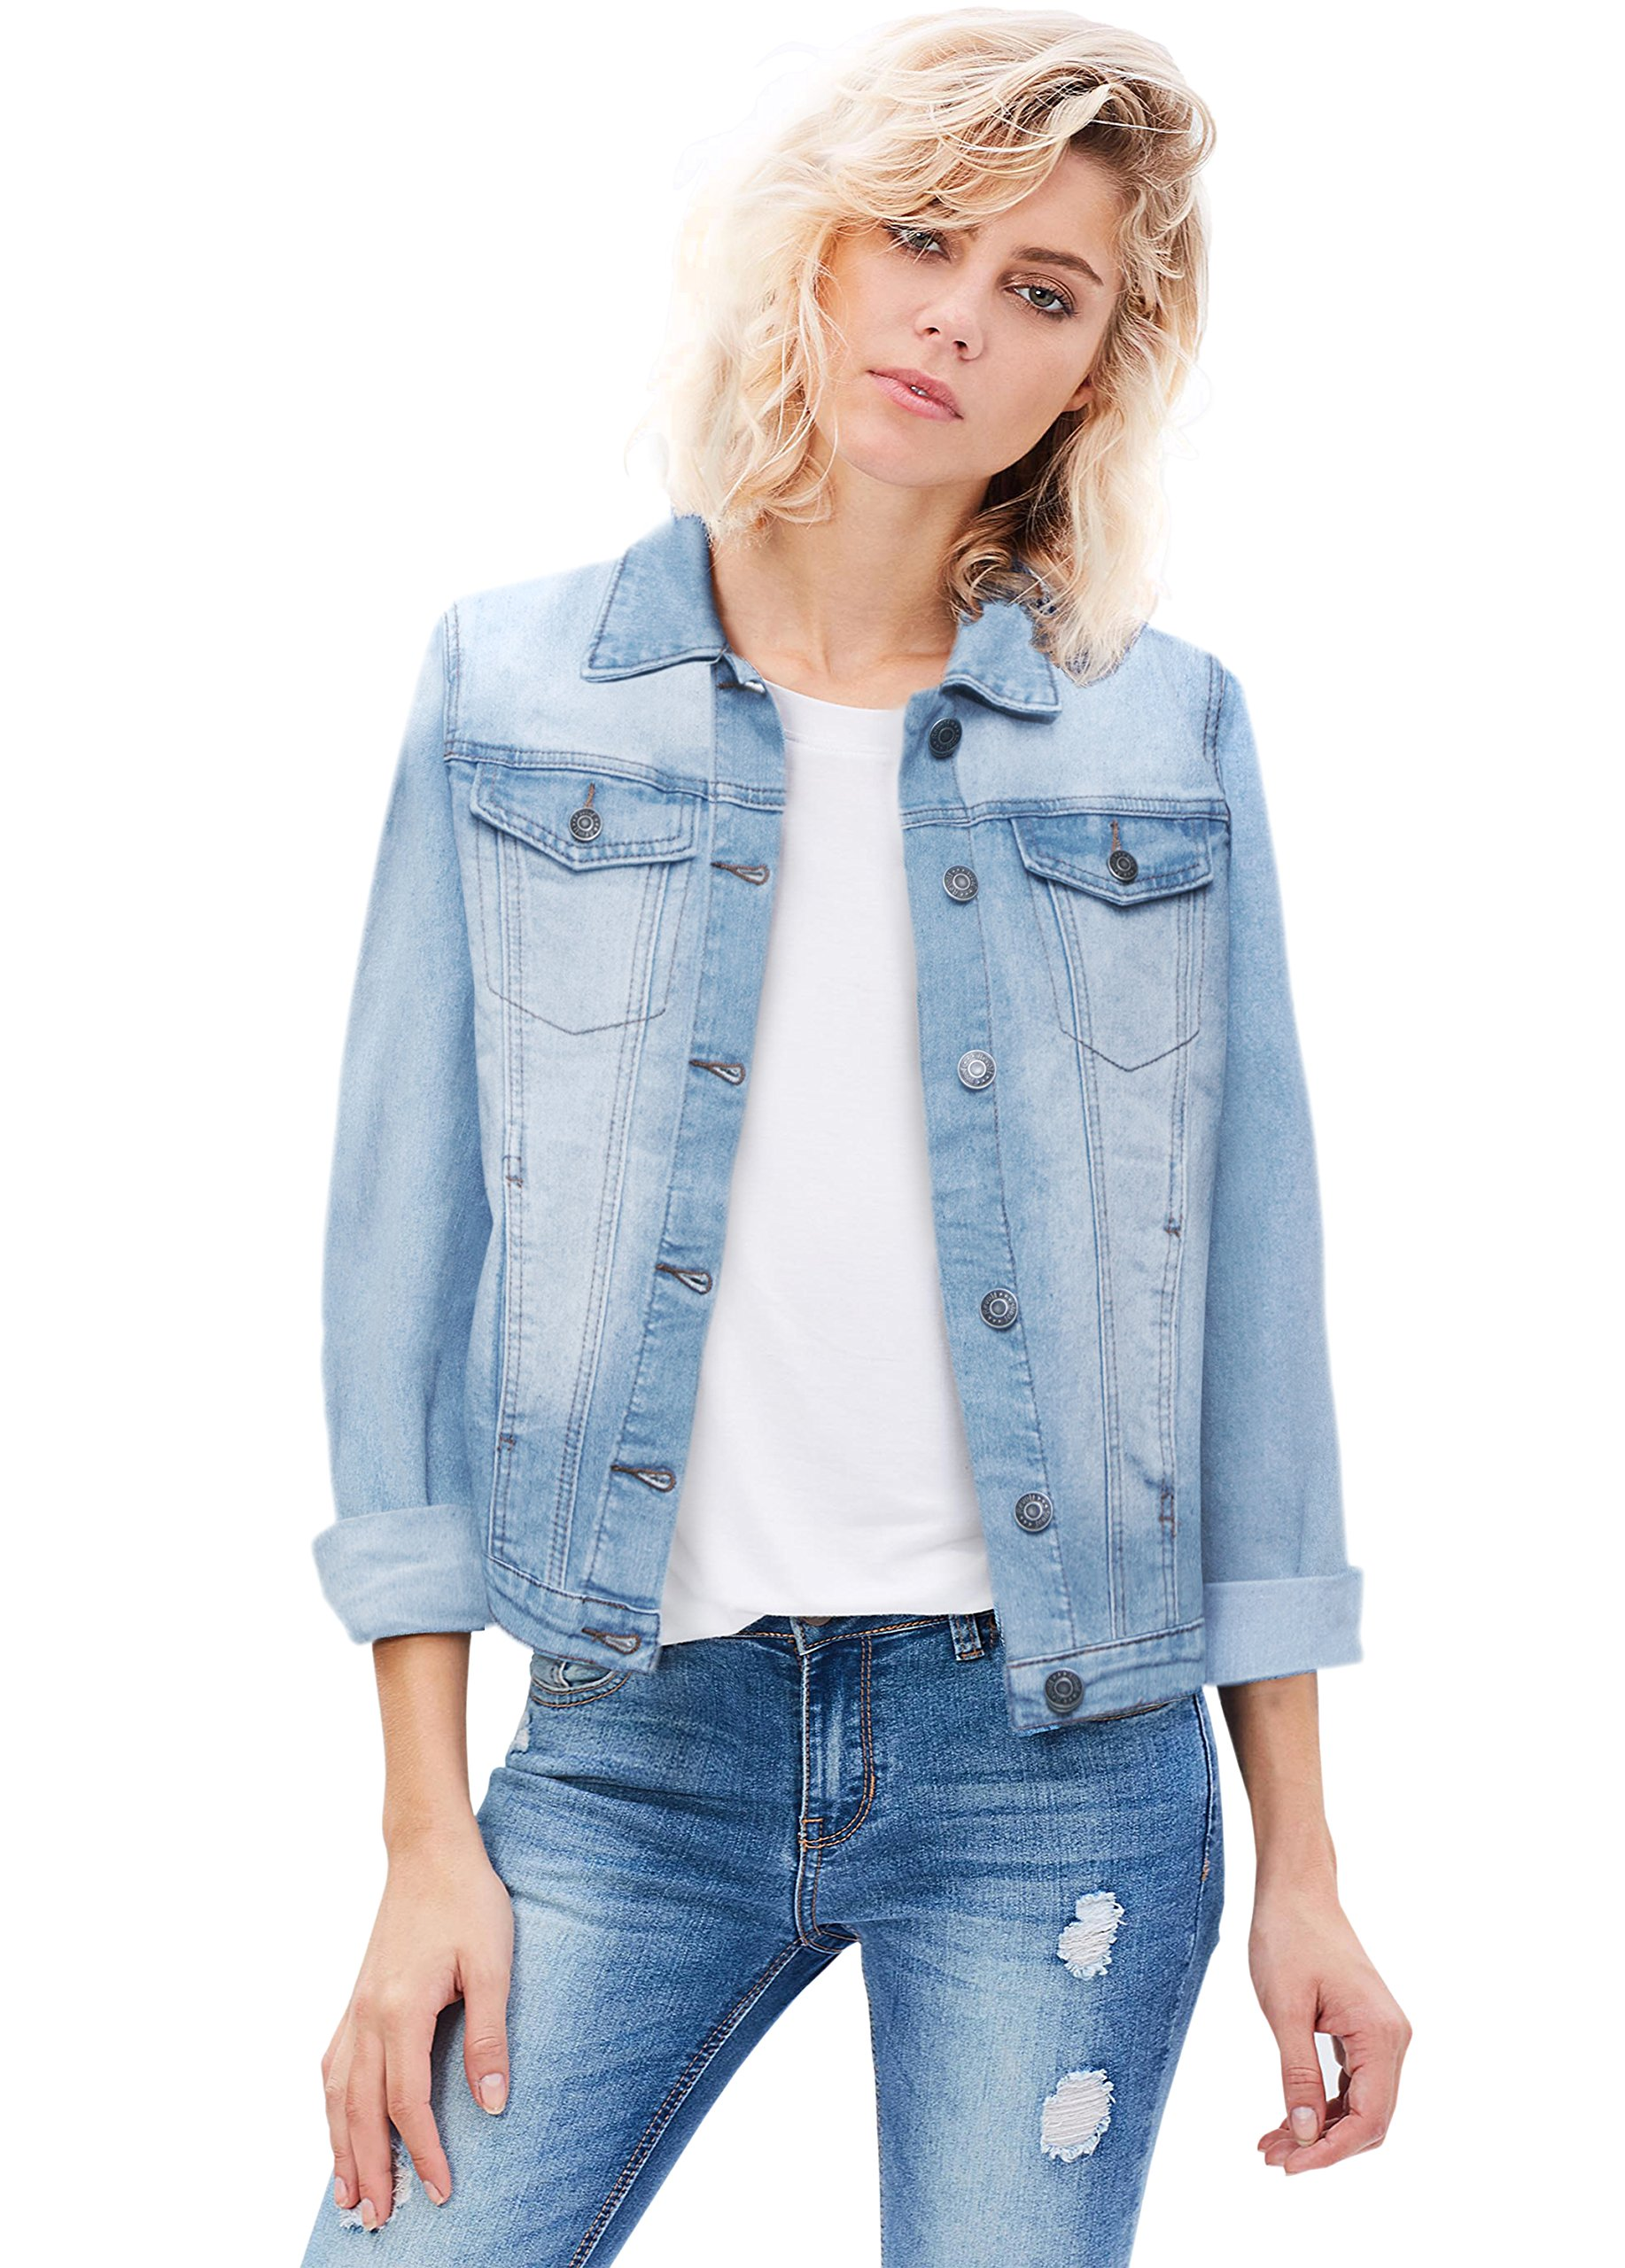 Revolt Women Junior Classic 4 Pockets Denim Jacket JK175590 Light WASH M